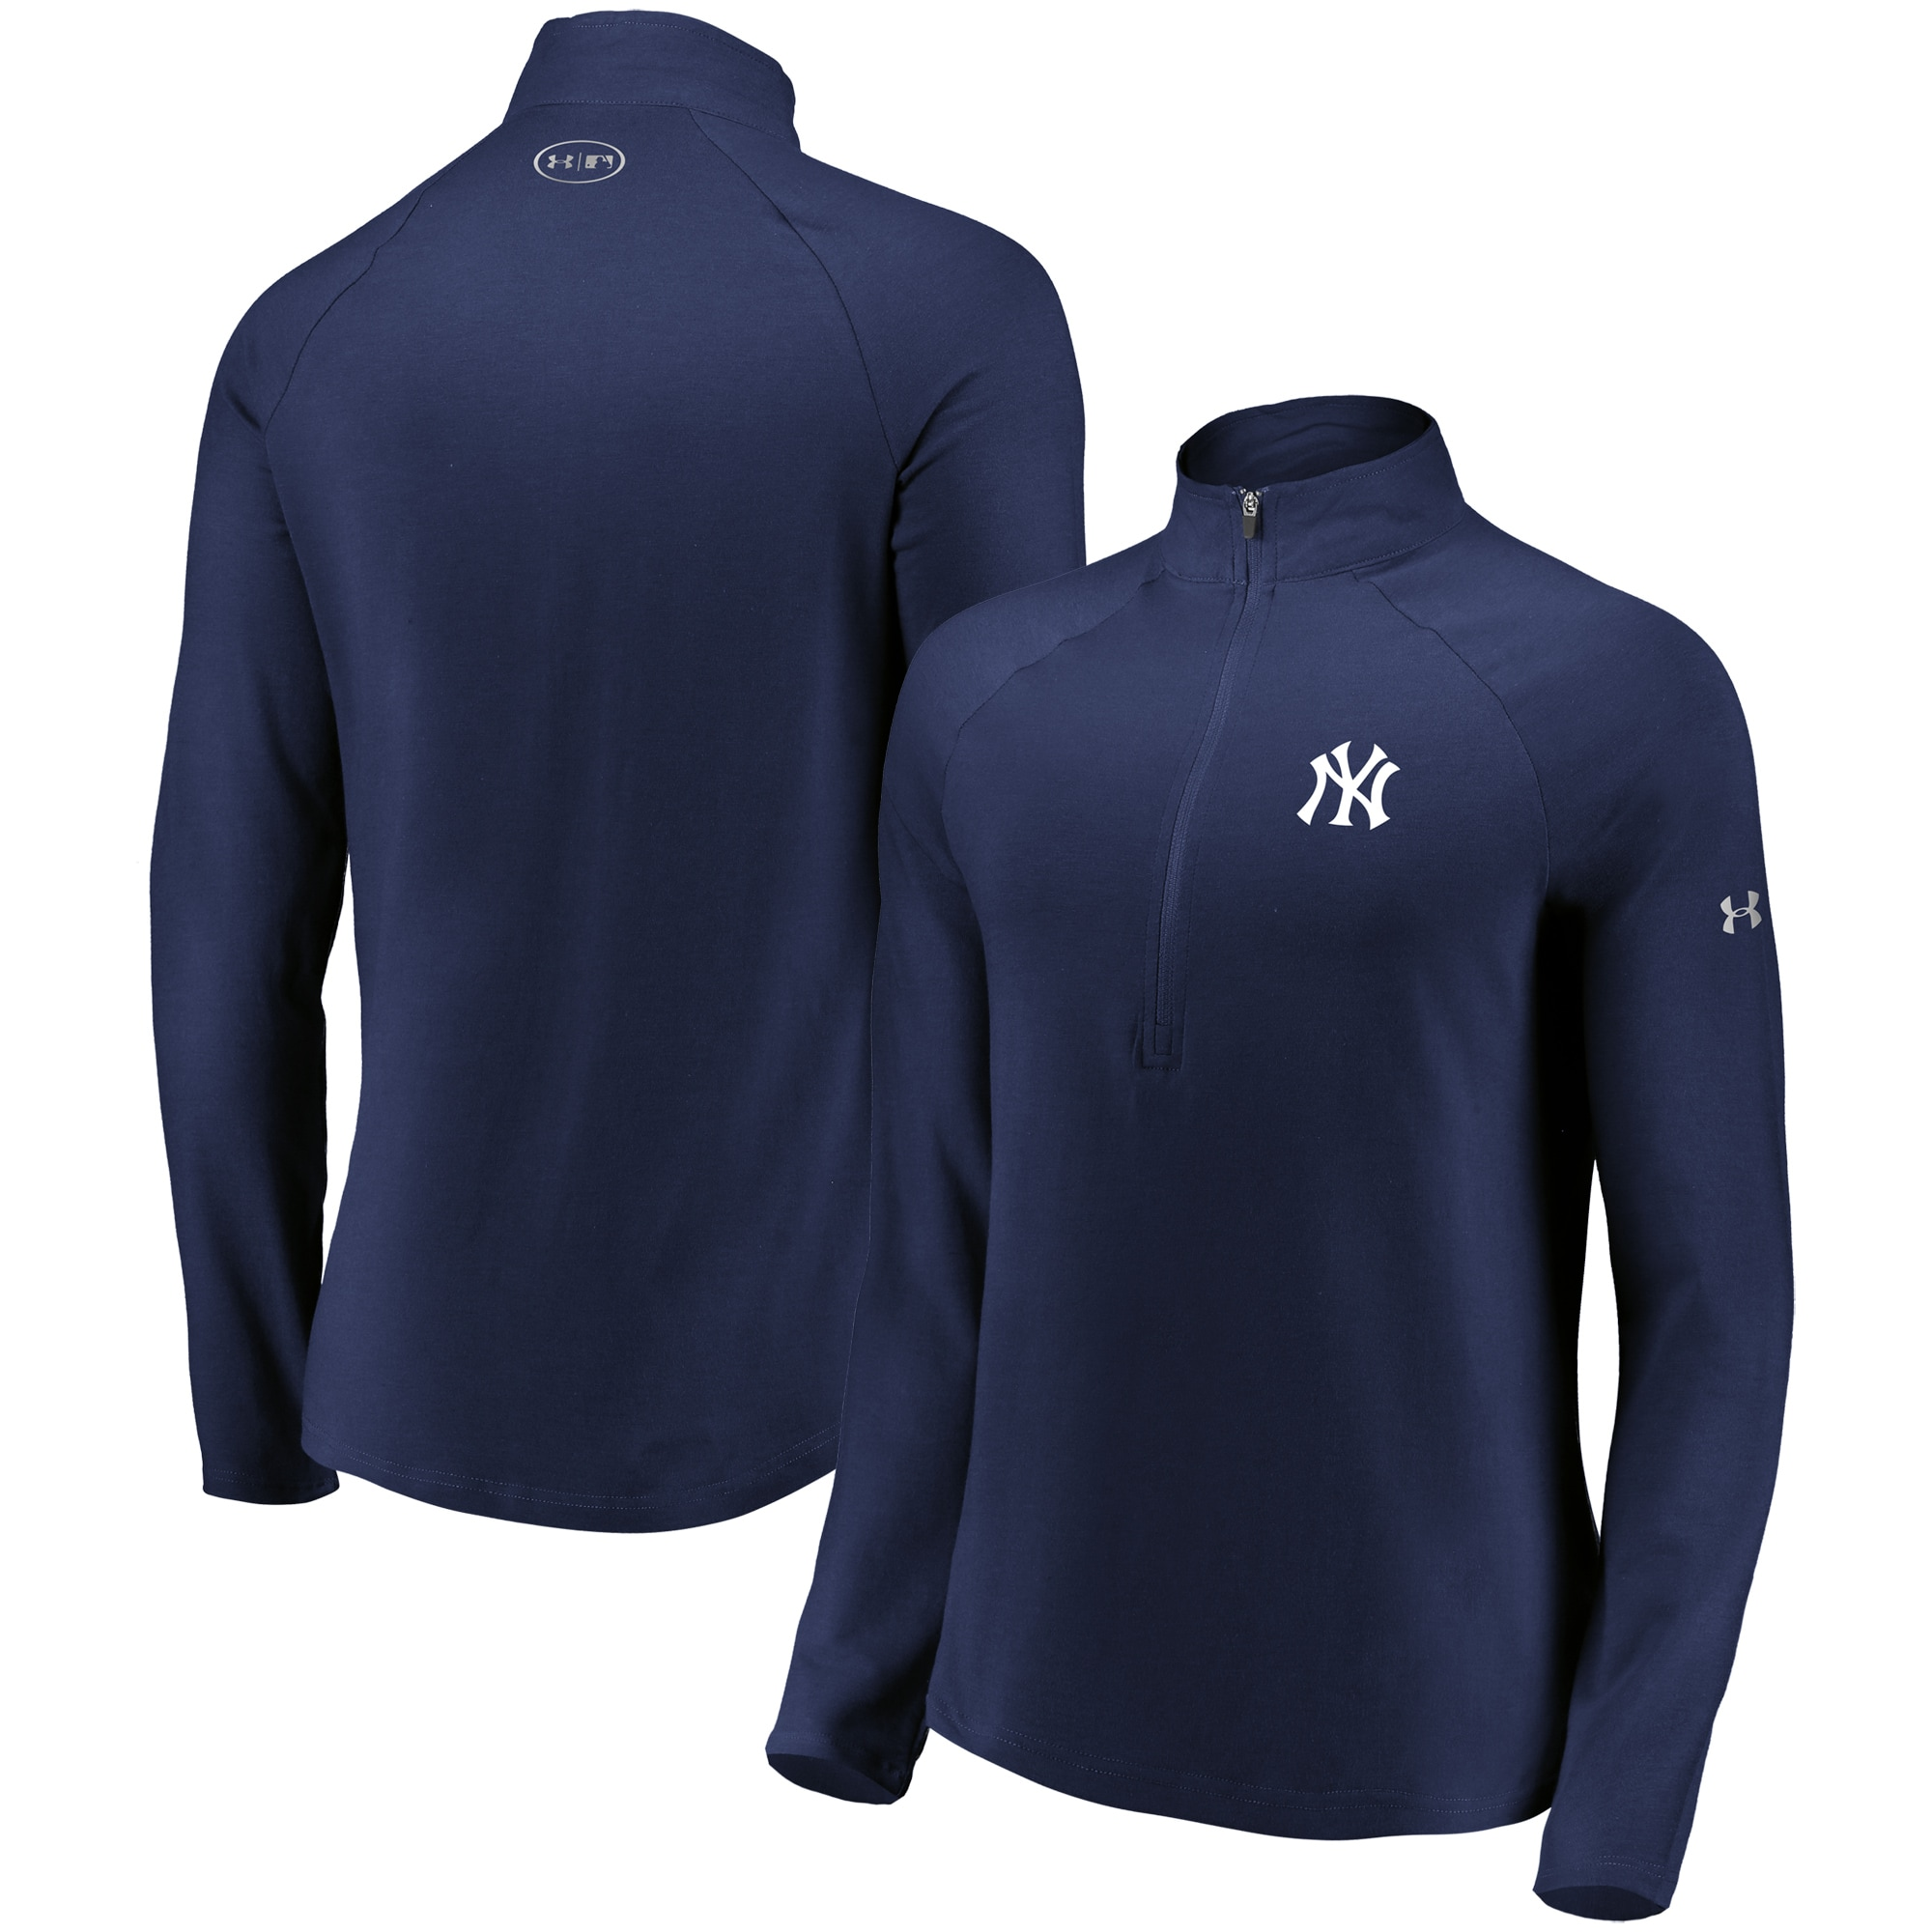 New York Yankees Under Armour Women's Passion Performance Tri-Blend Raglan Half-Zip Pullover Jacket - Navy